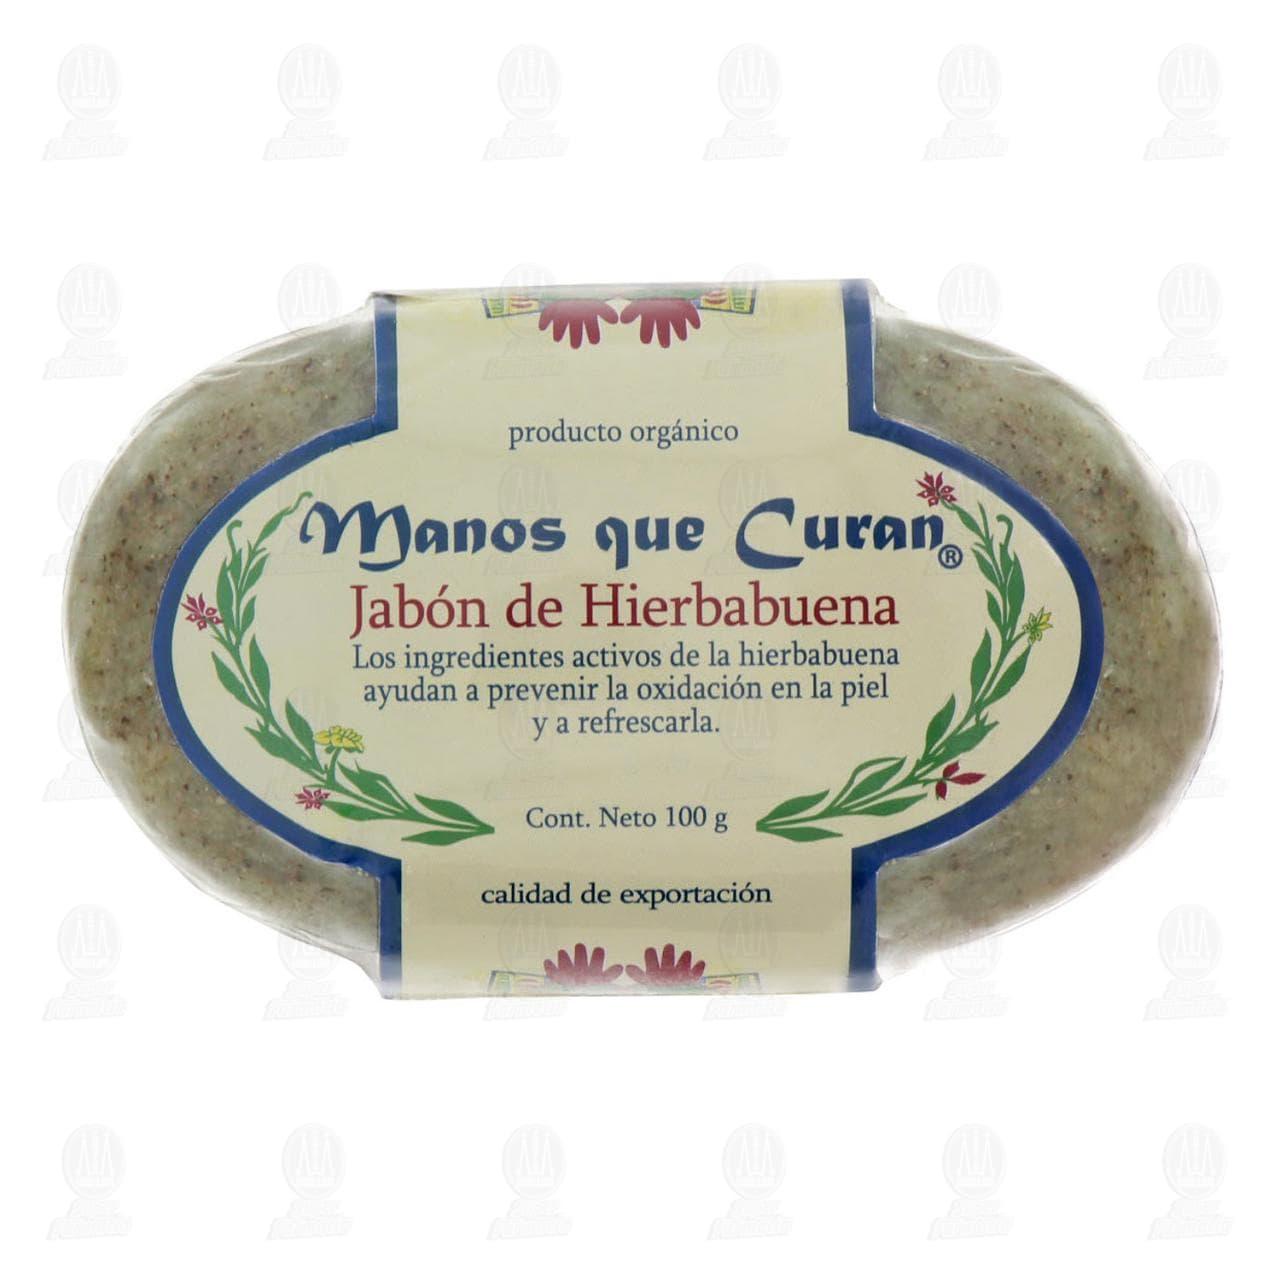 comprar https://www.movil.farmaciasguadalajara.com/wcsstore/FGCAS/wcs/products/1330713_S_1280_F.jpg en farmacias guadalajara